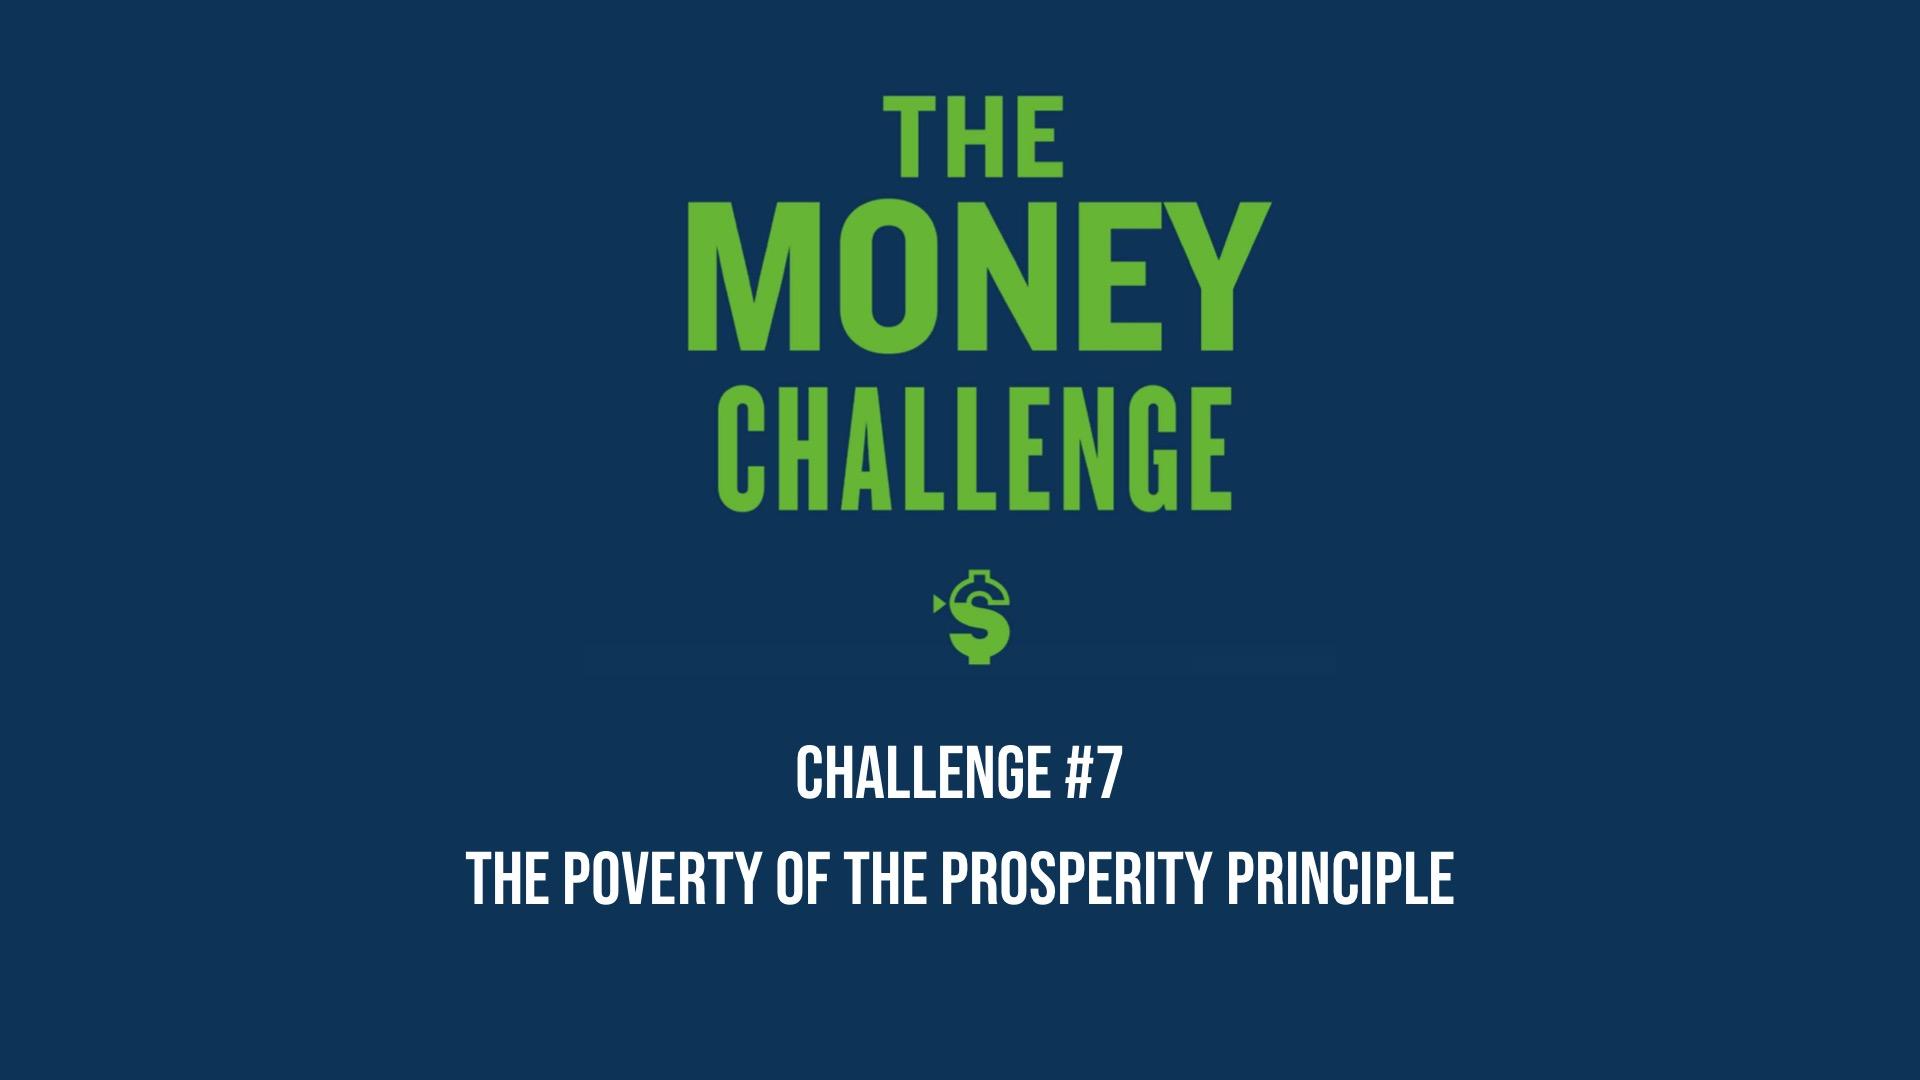 The Money Challenge #7 – The Poverty of the Prosperity Principle